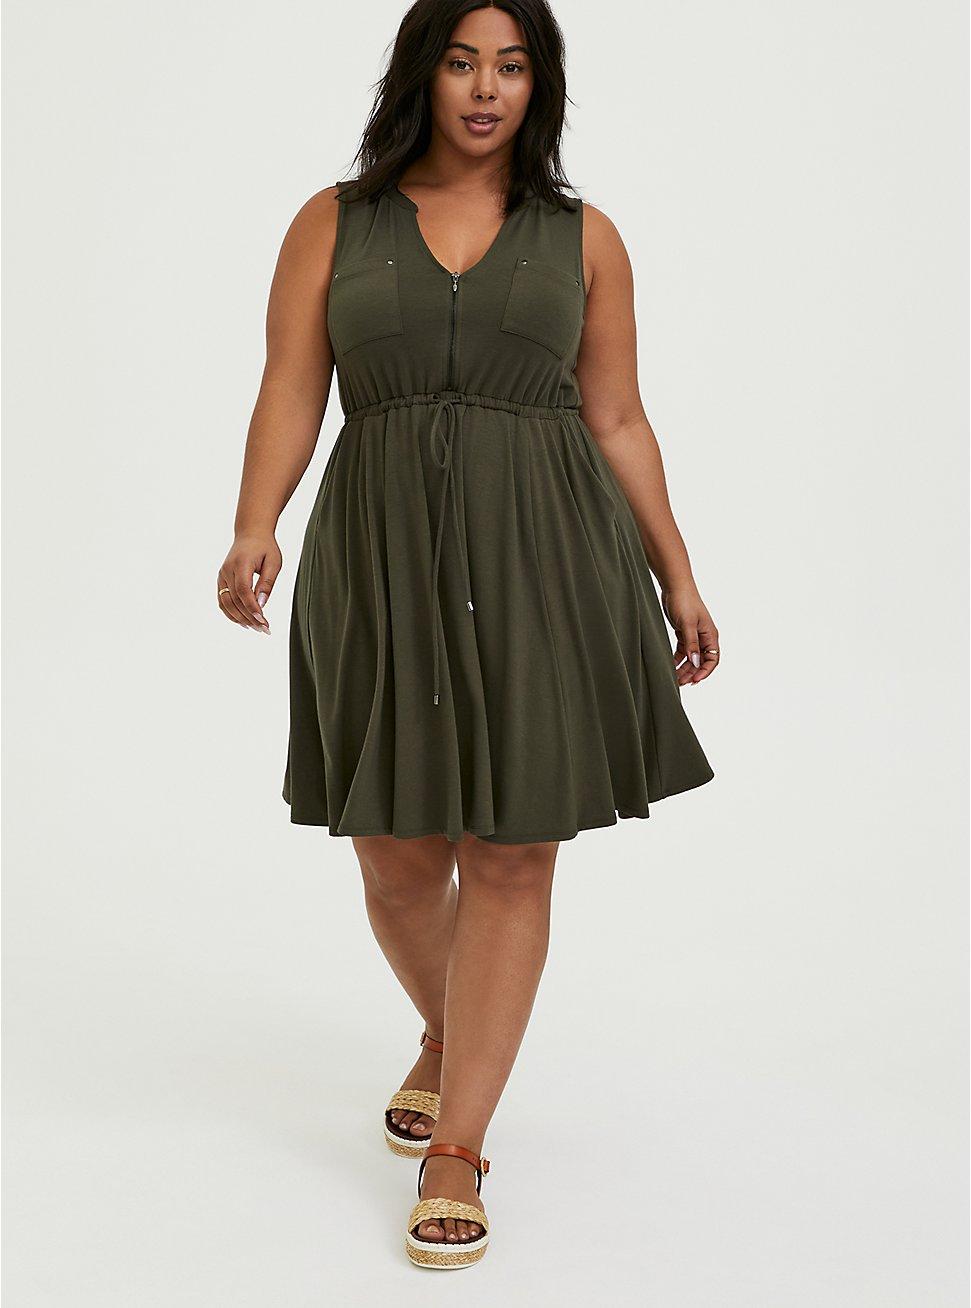 Plus Size Olive Green Jersey Zip Front Drawstring Shirt Dress, DEEP DEPTHS, hi-res